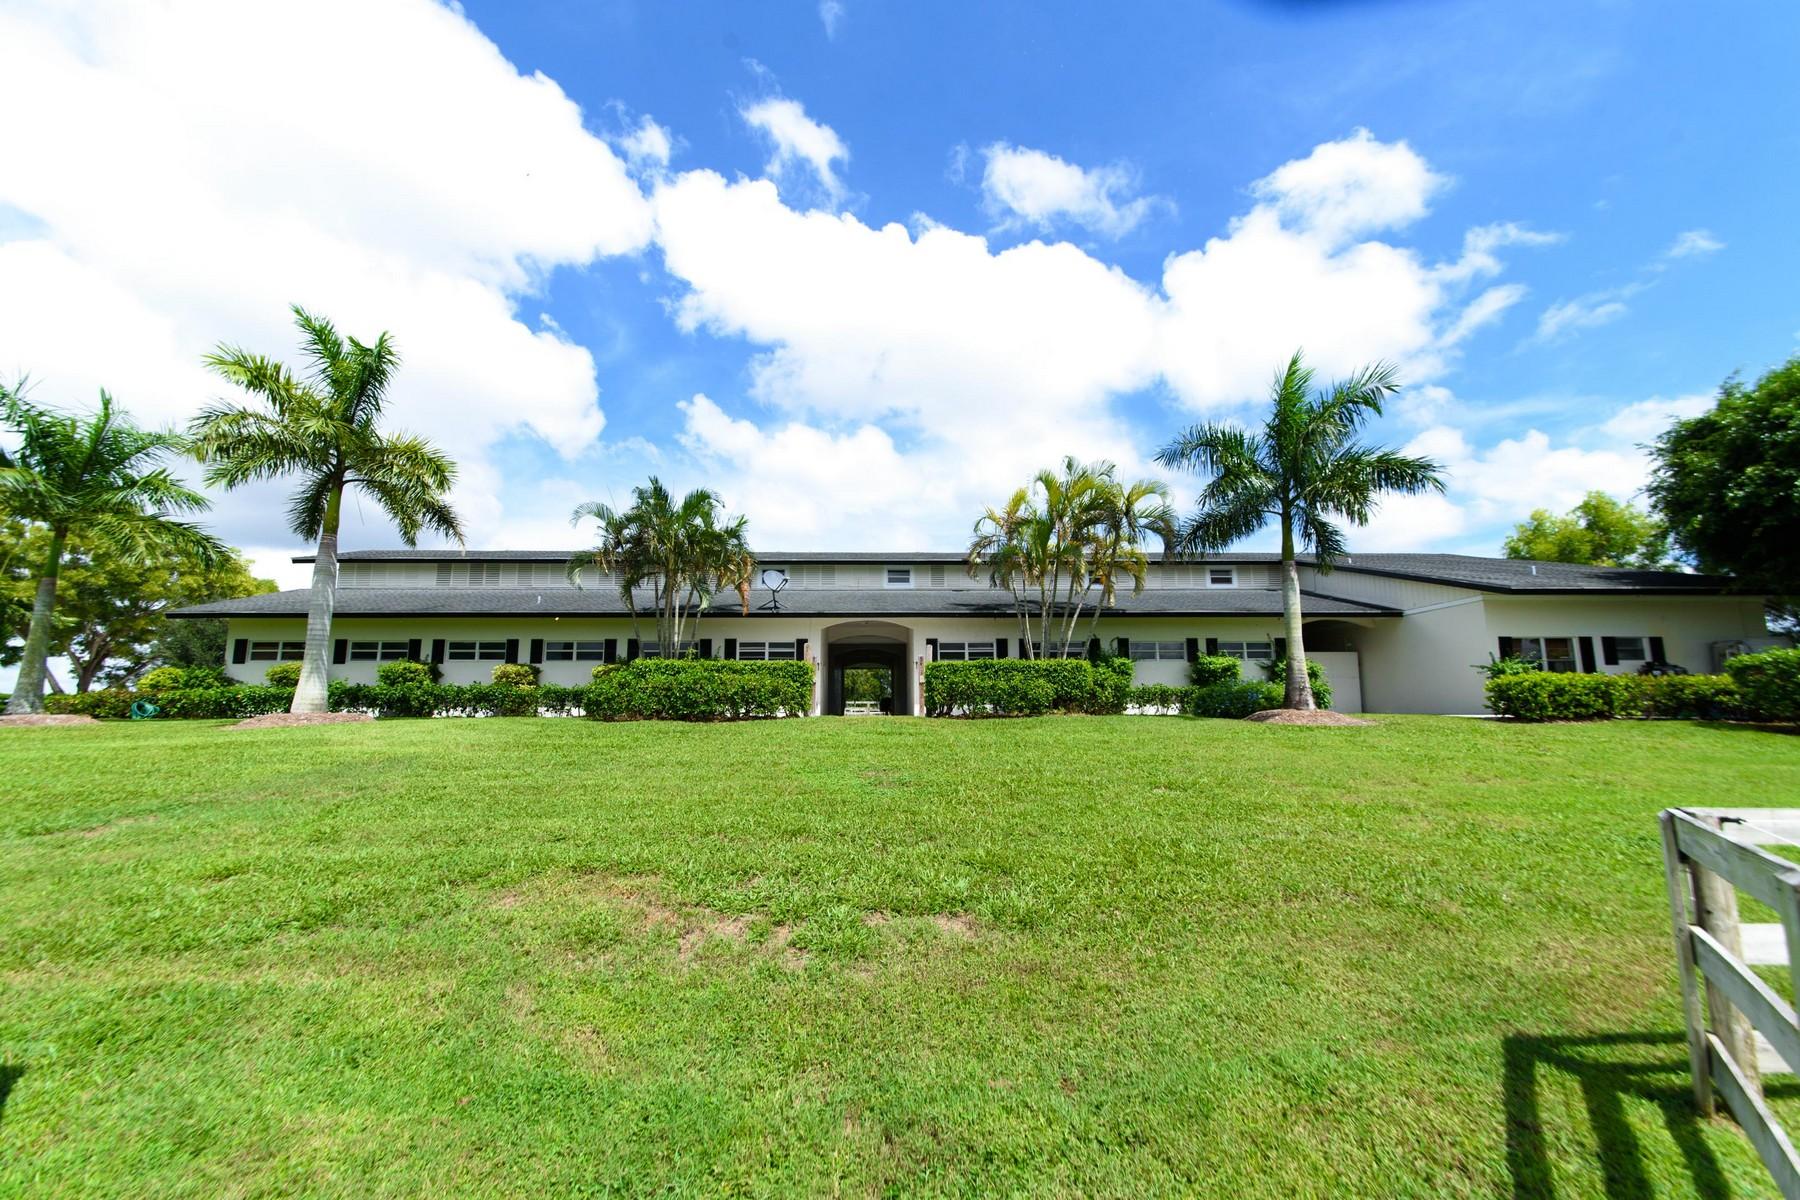 Villa per Vendita alle ore 14390 Palm Beach Point Blvd Palm Beach Point East, Wellington, Florida, 33414 Stati Uniti